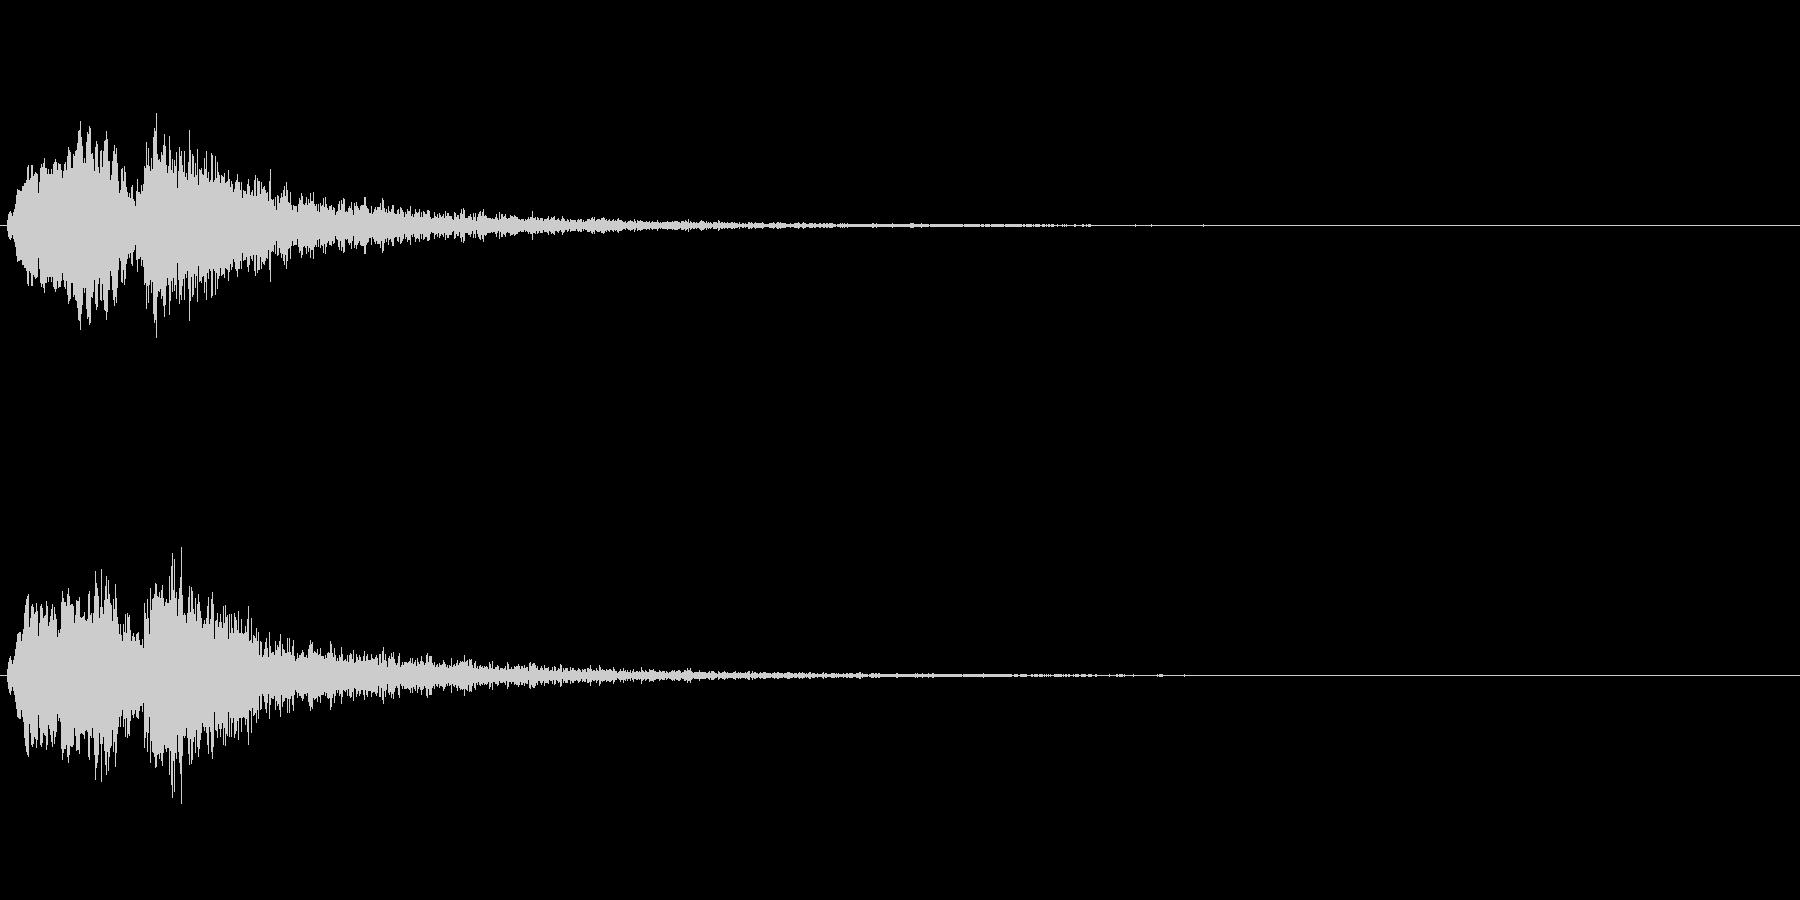 Vox 不気味な鳴き声 ホラーSE 3の未再生の波形